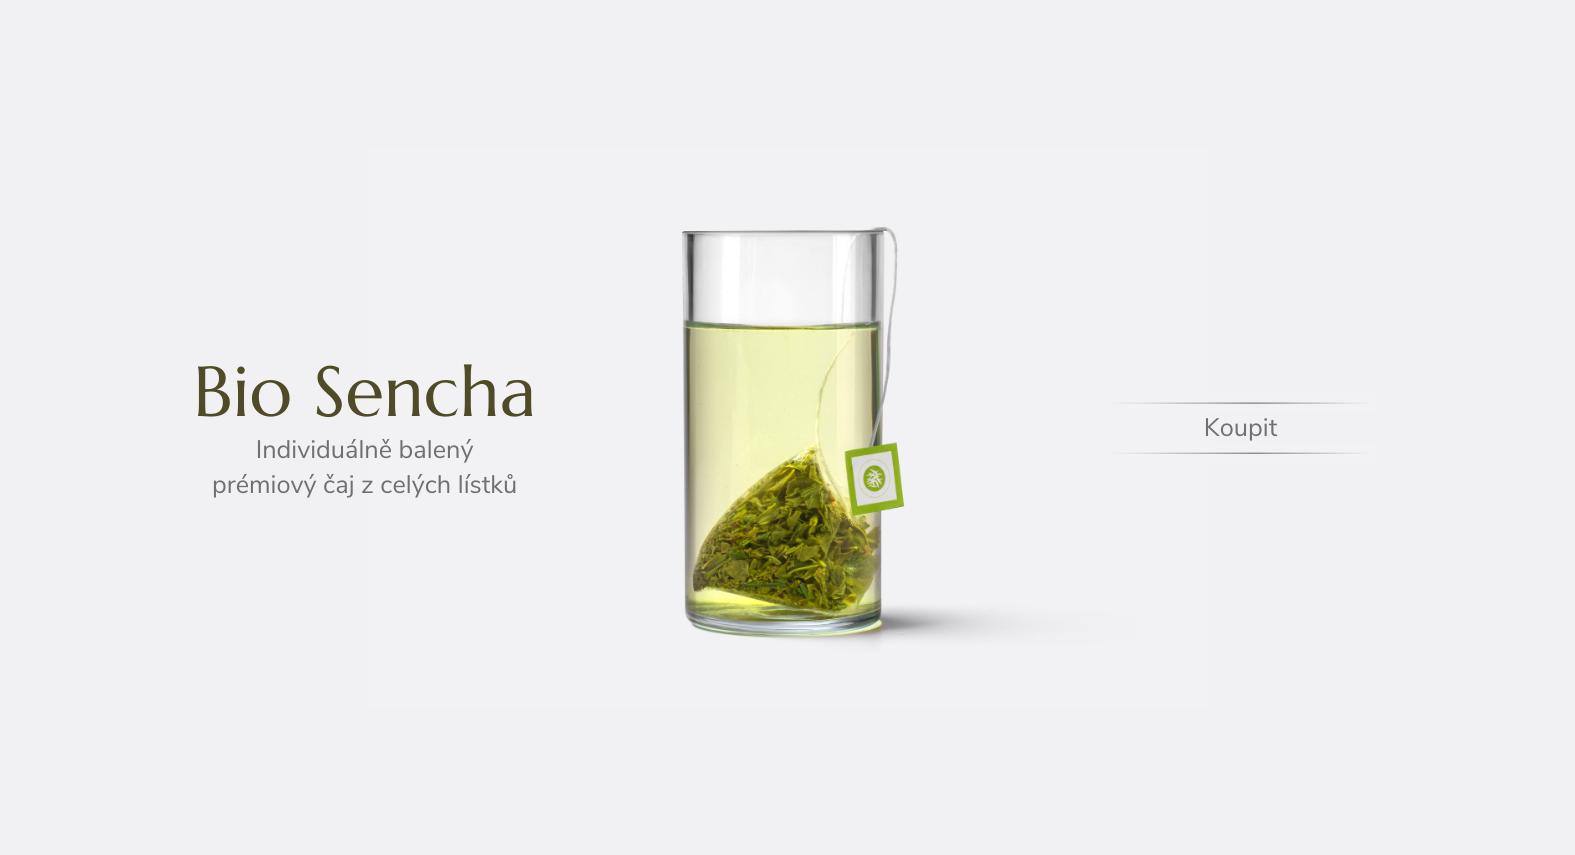 Bio Sencha